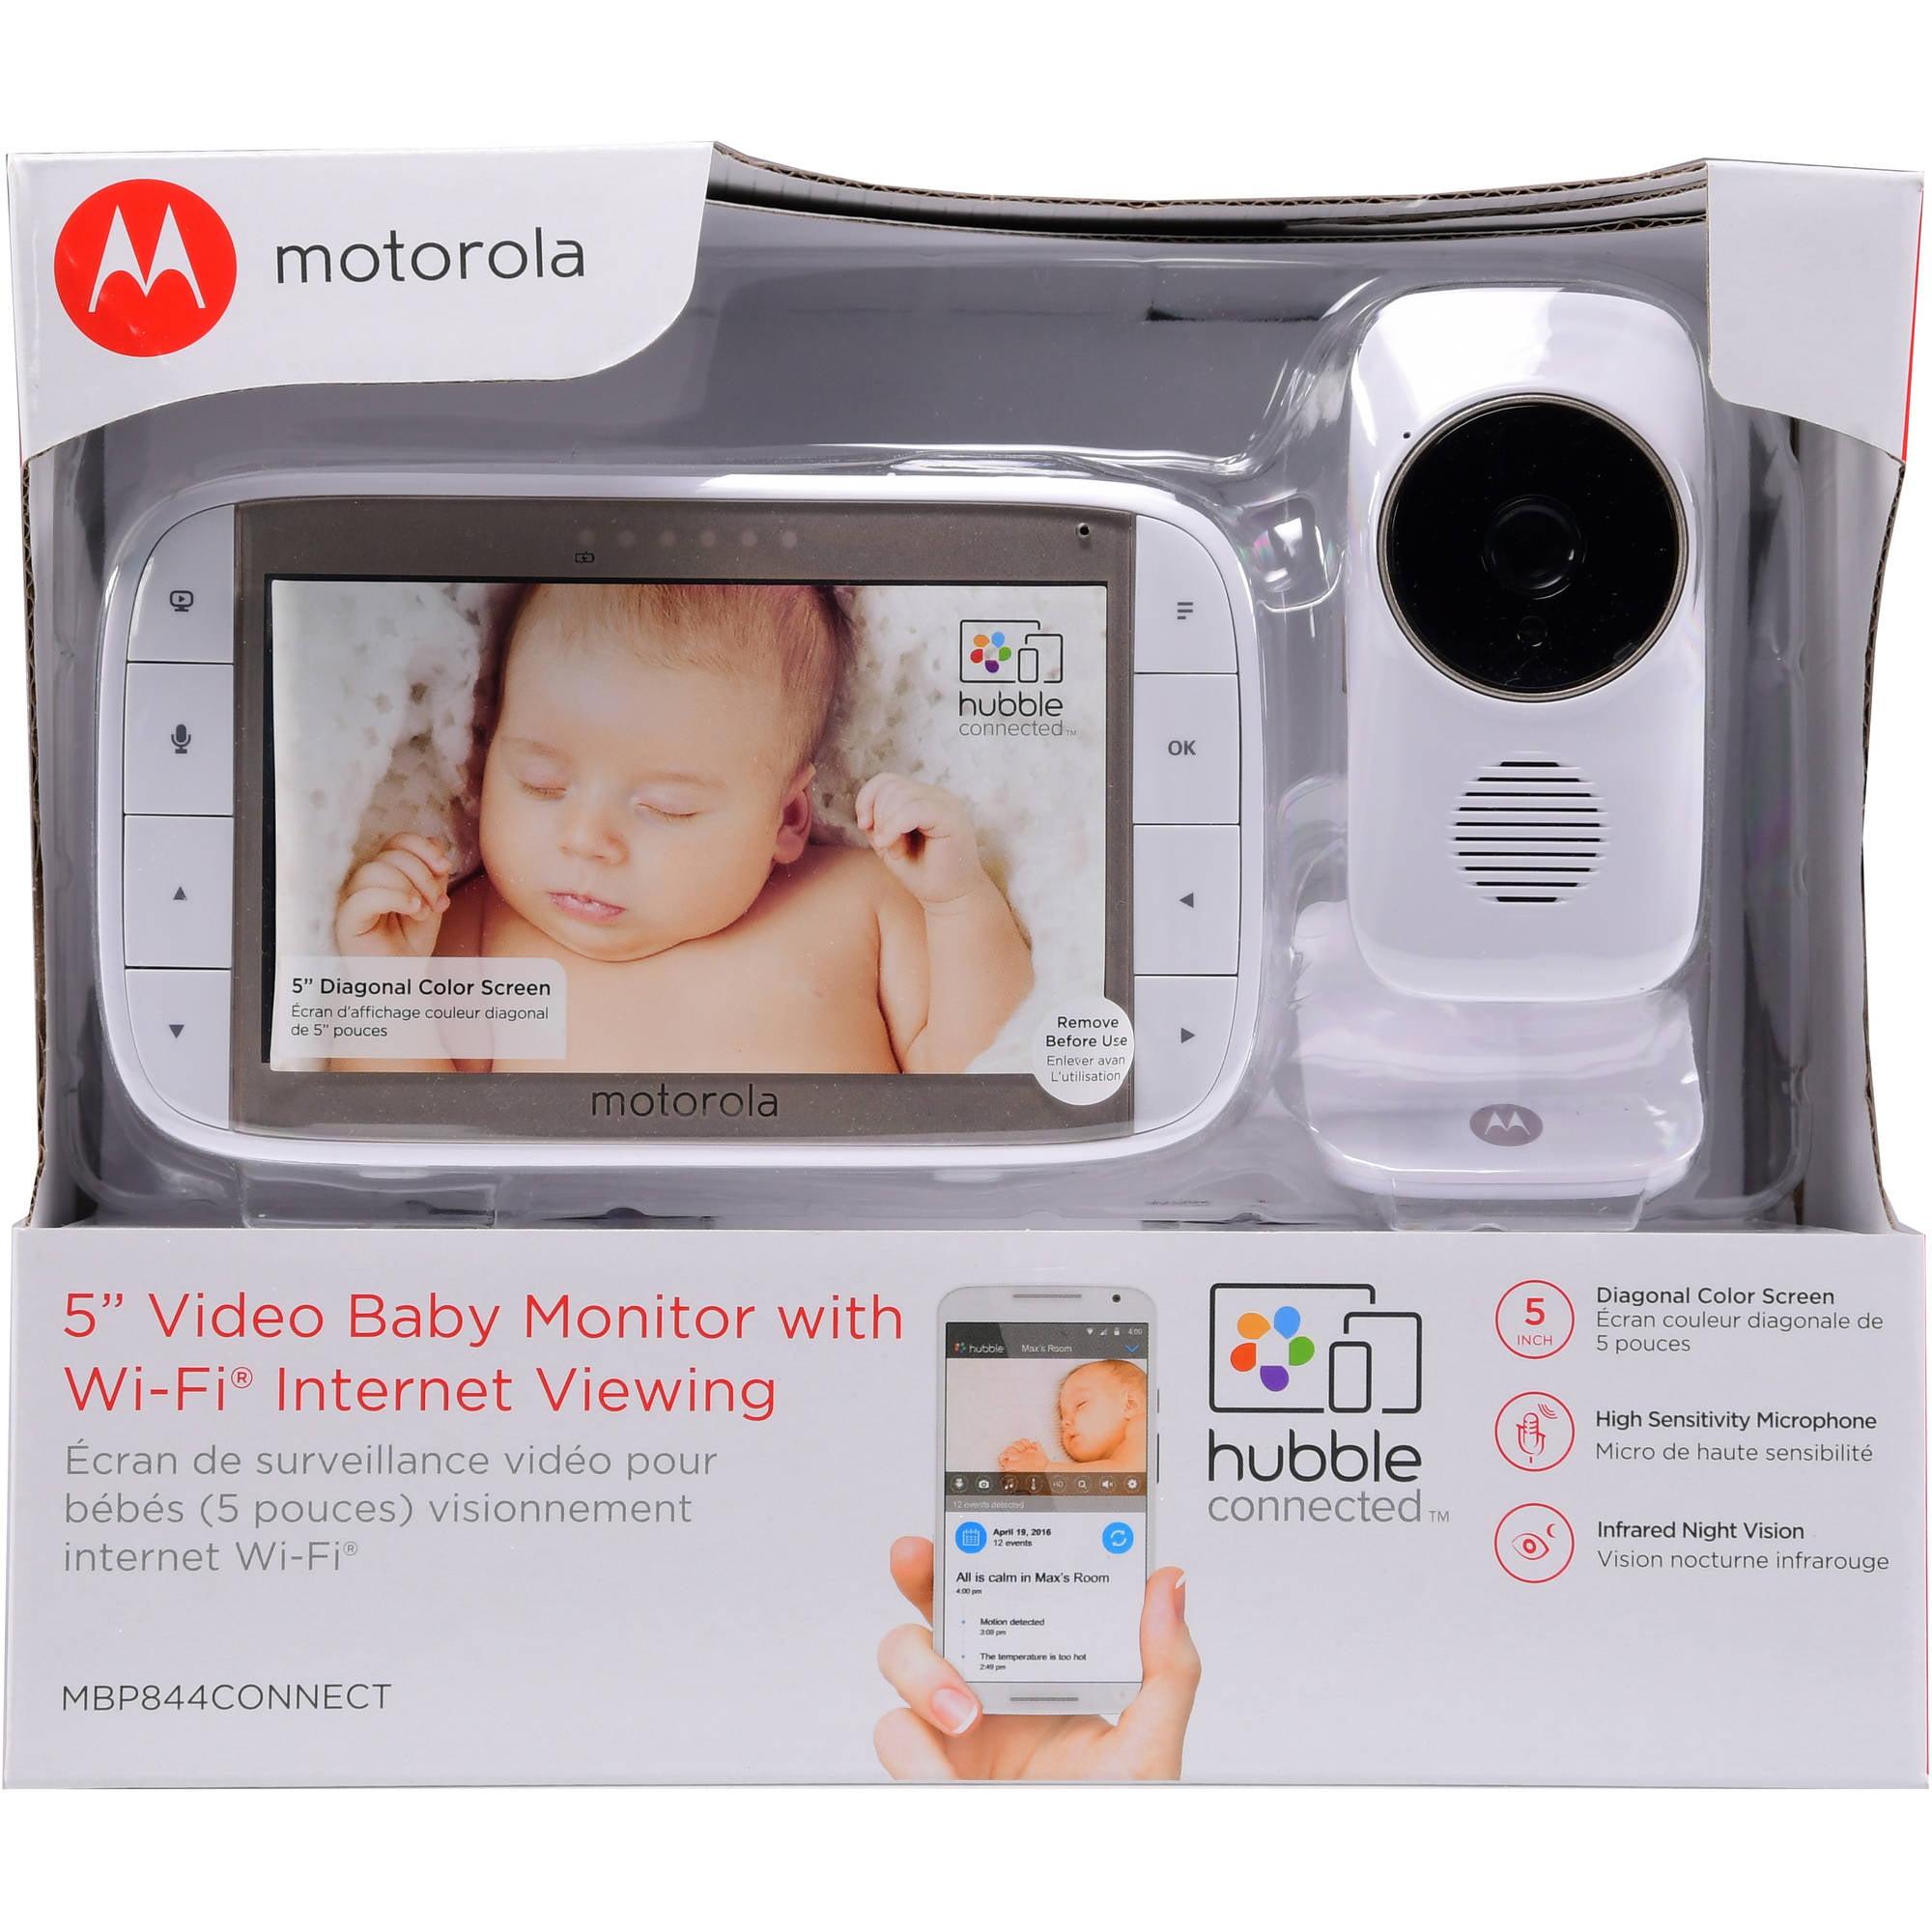 Motorola MBP844 Connect, Wi-Fi Baby Monitor